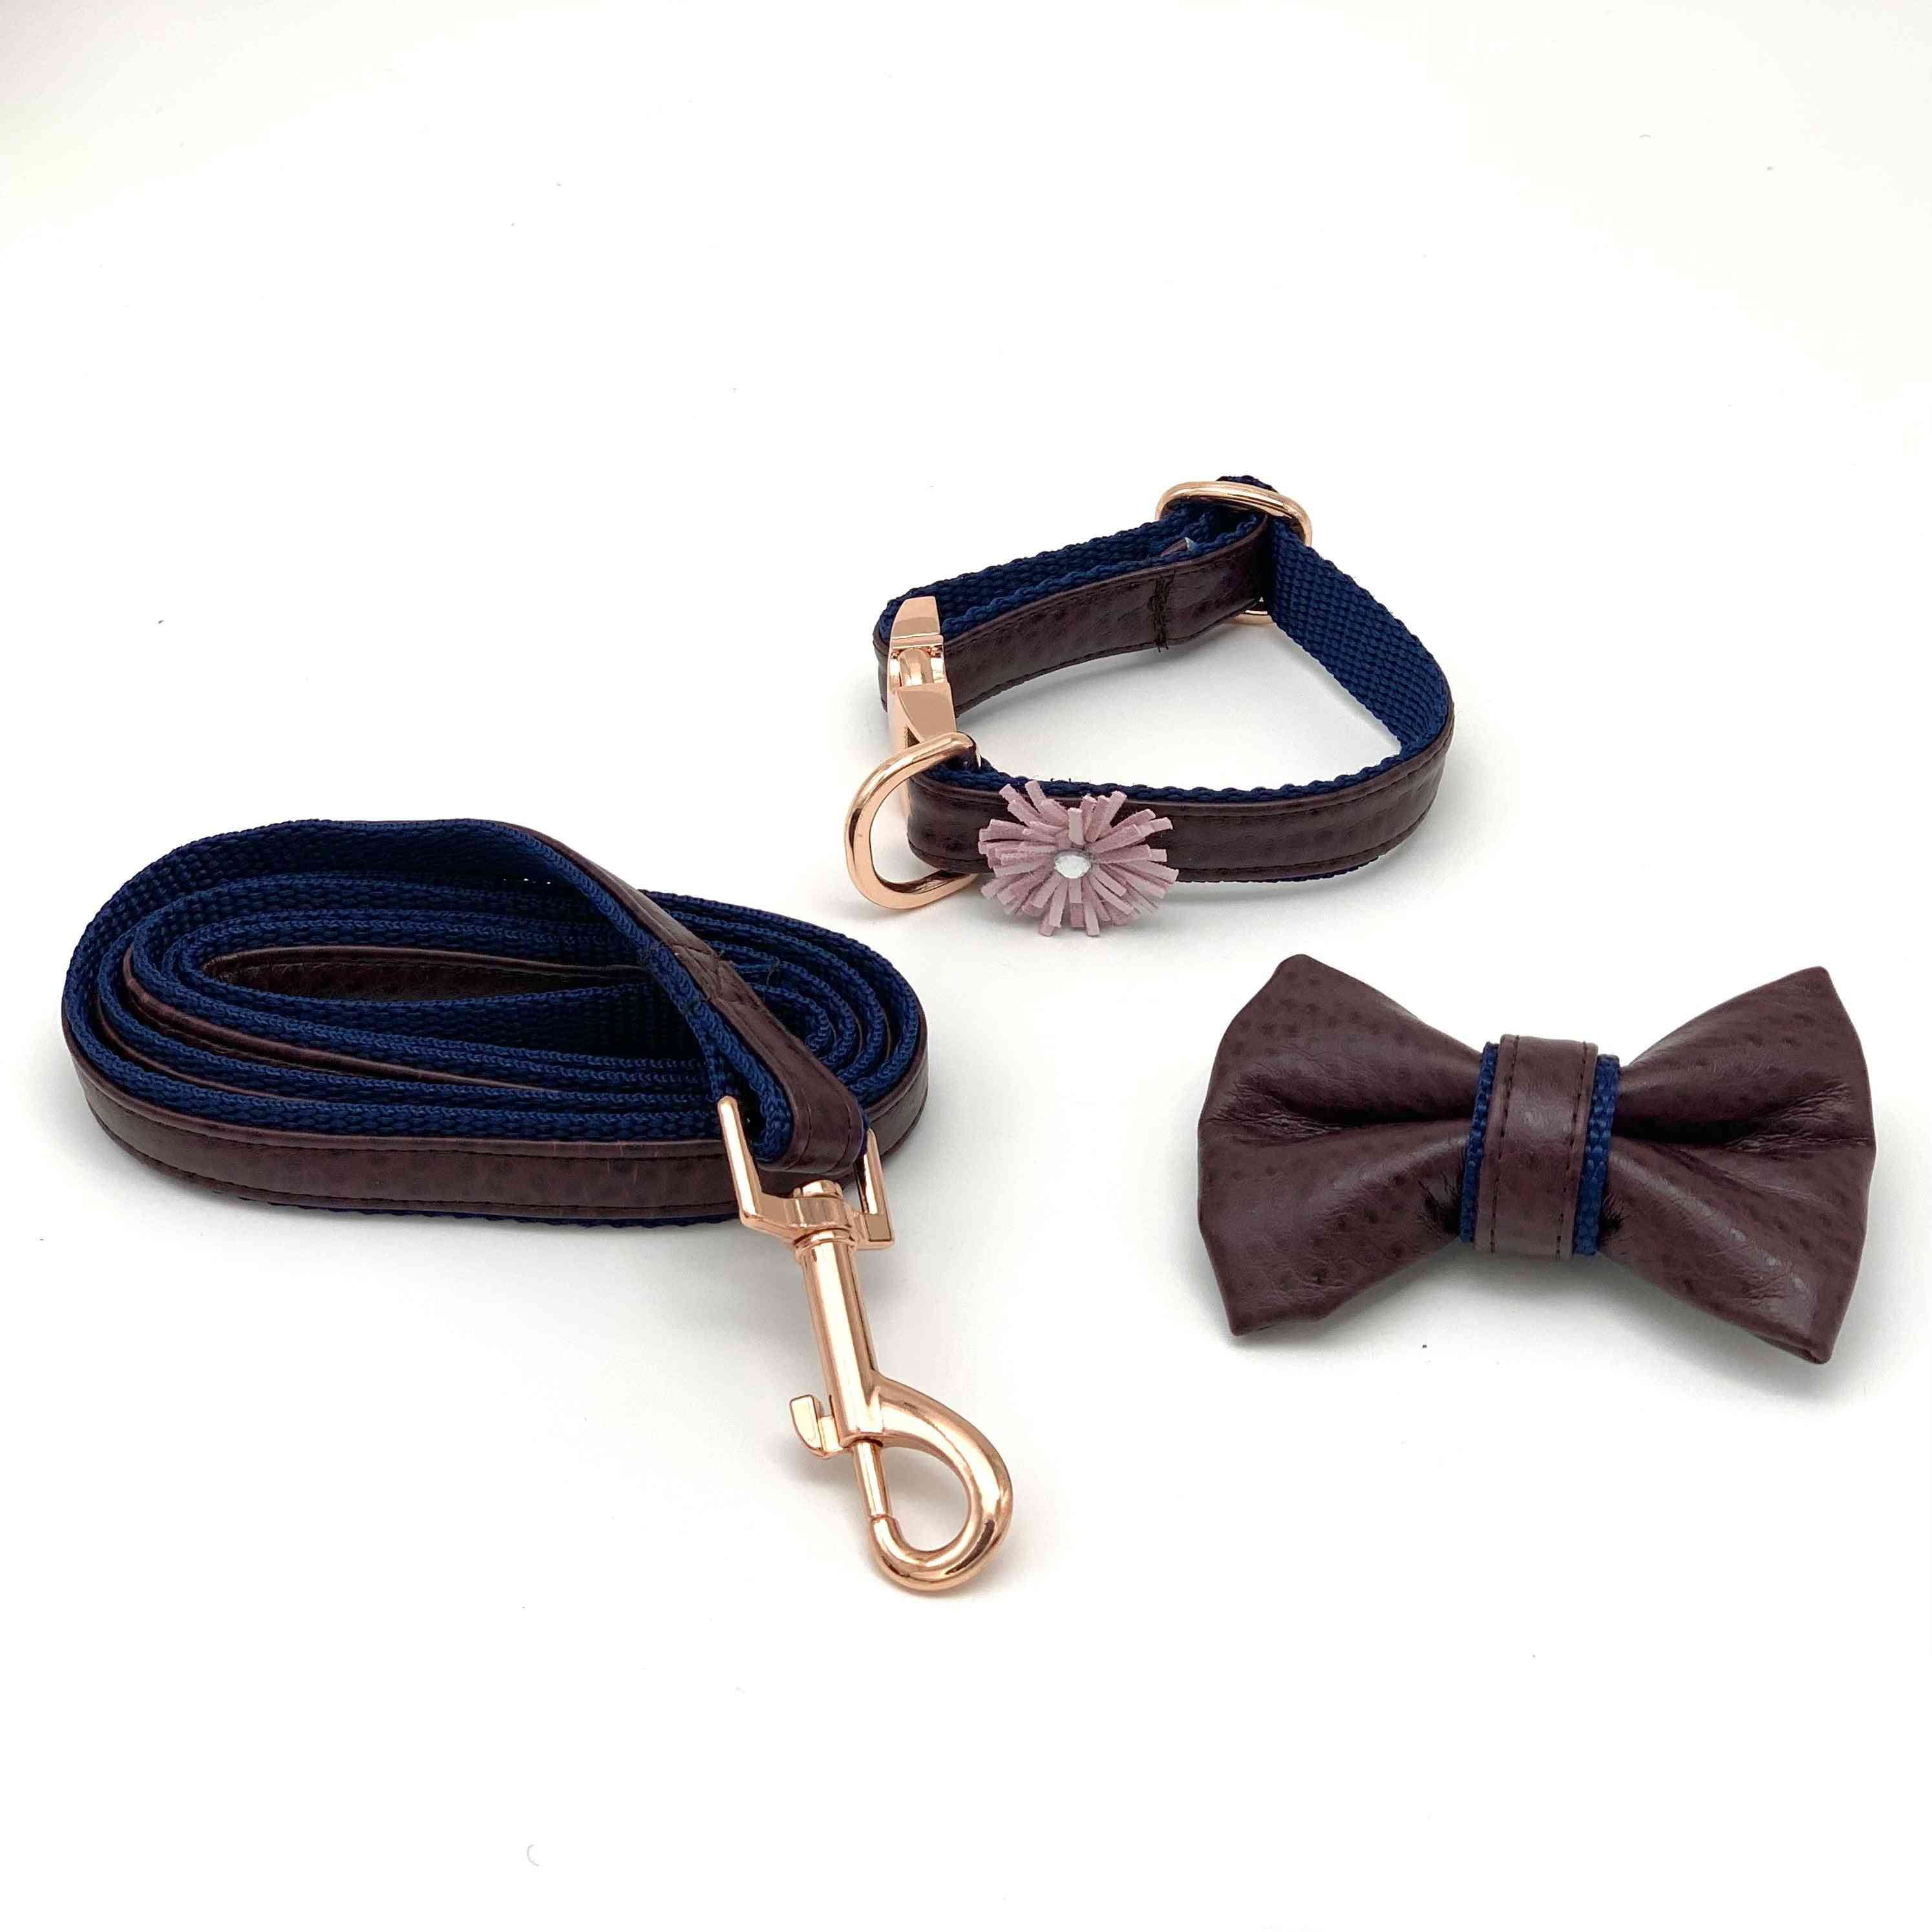 Burgundy & Navy Leather Leash